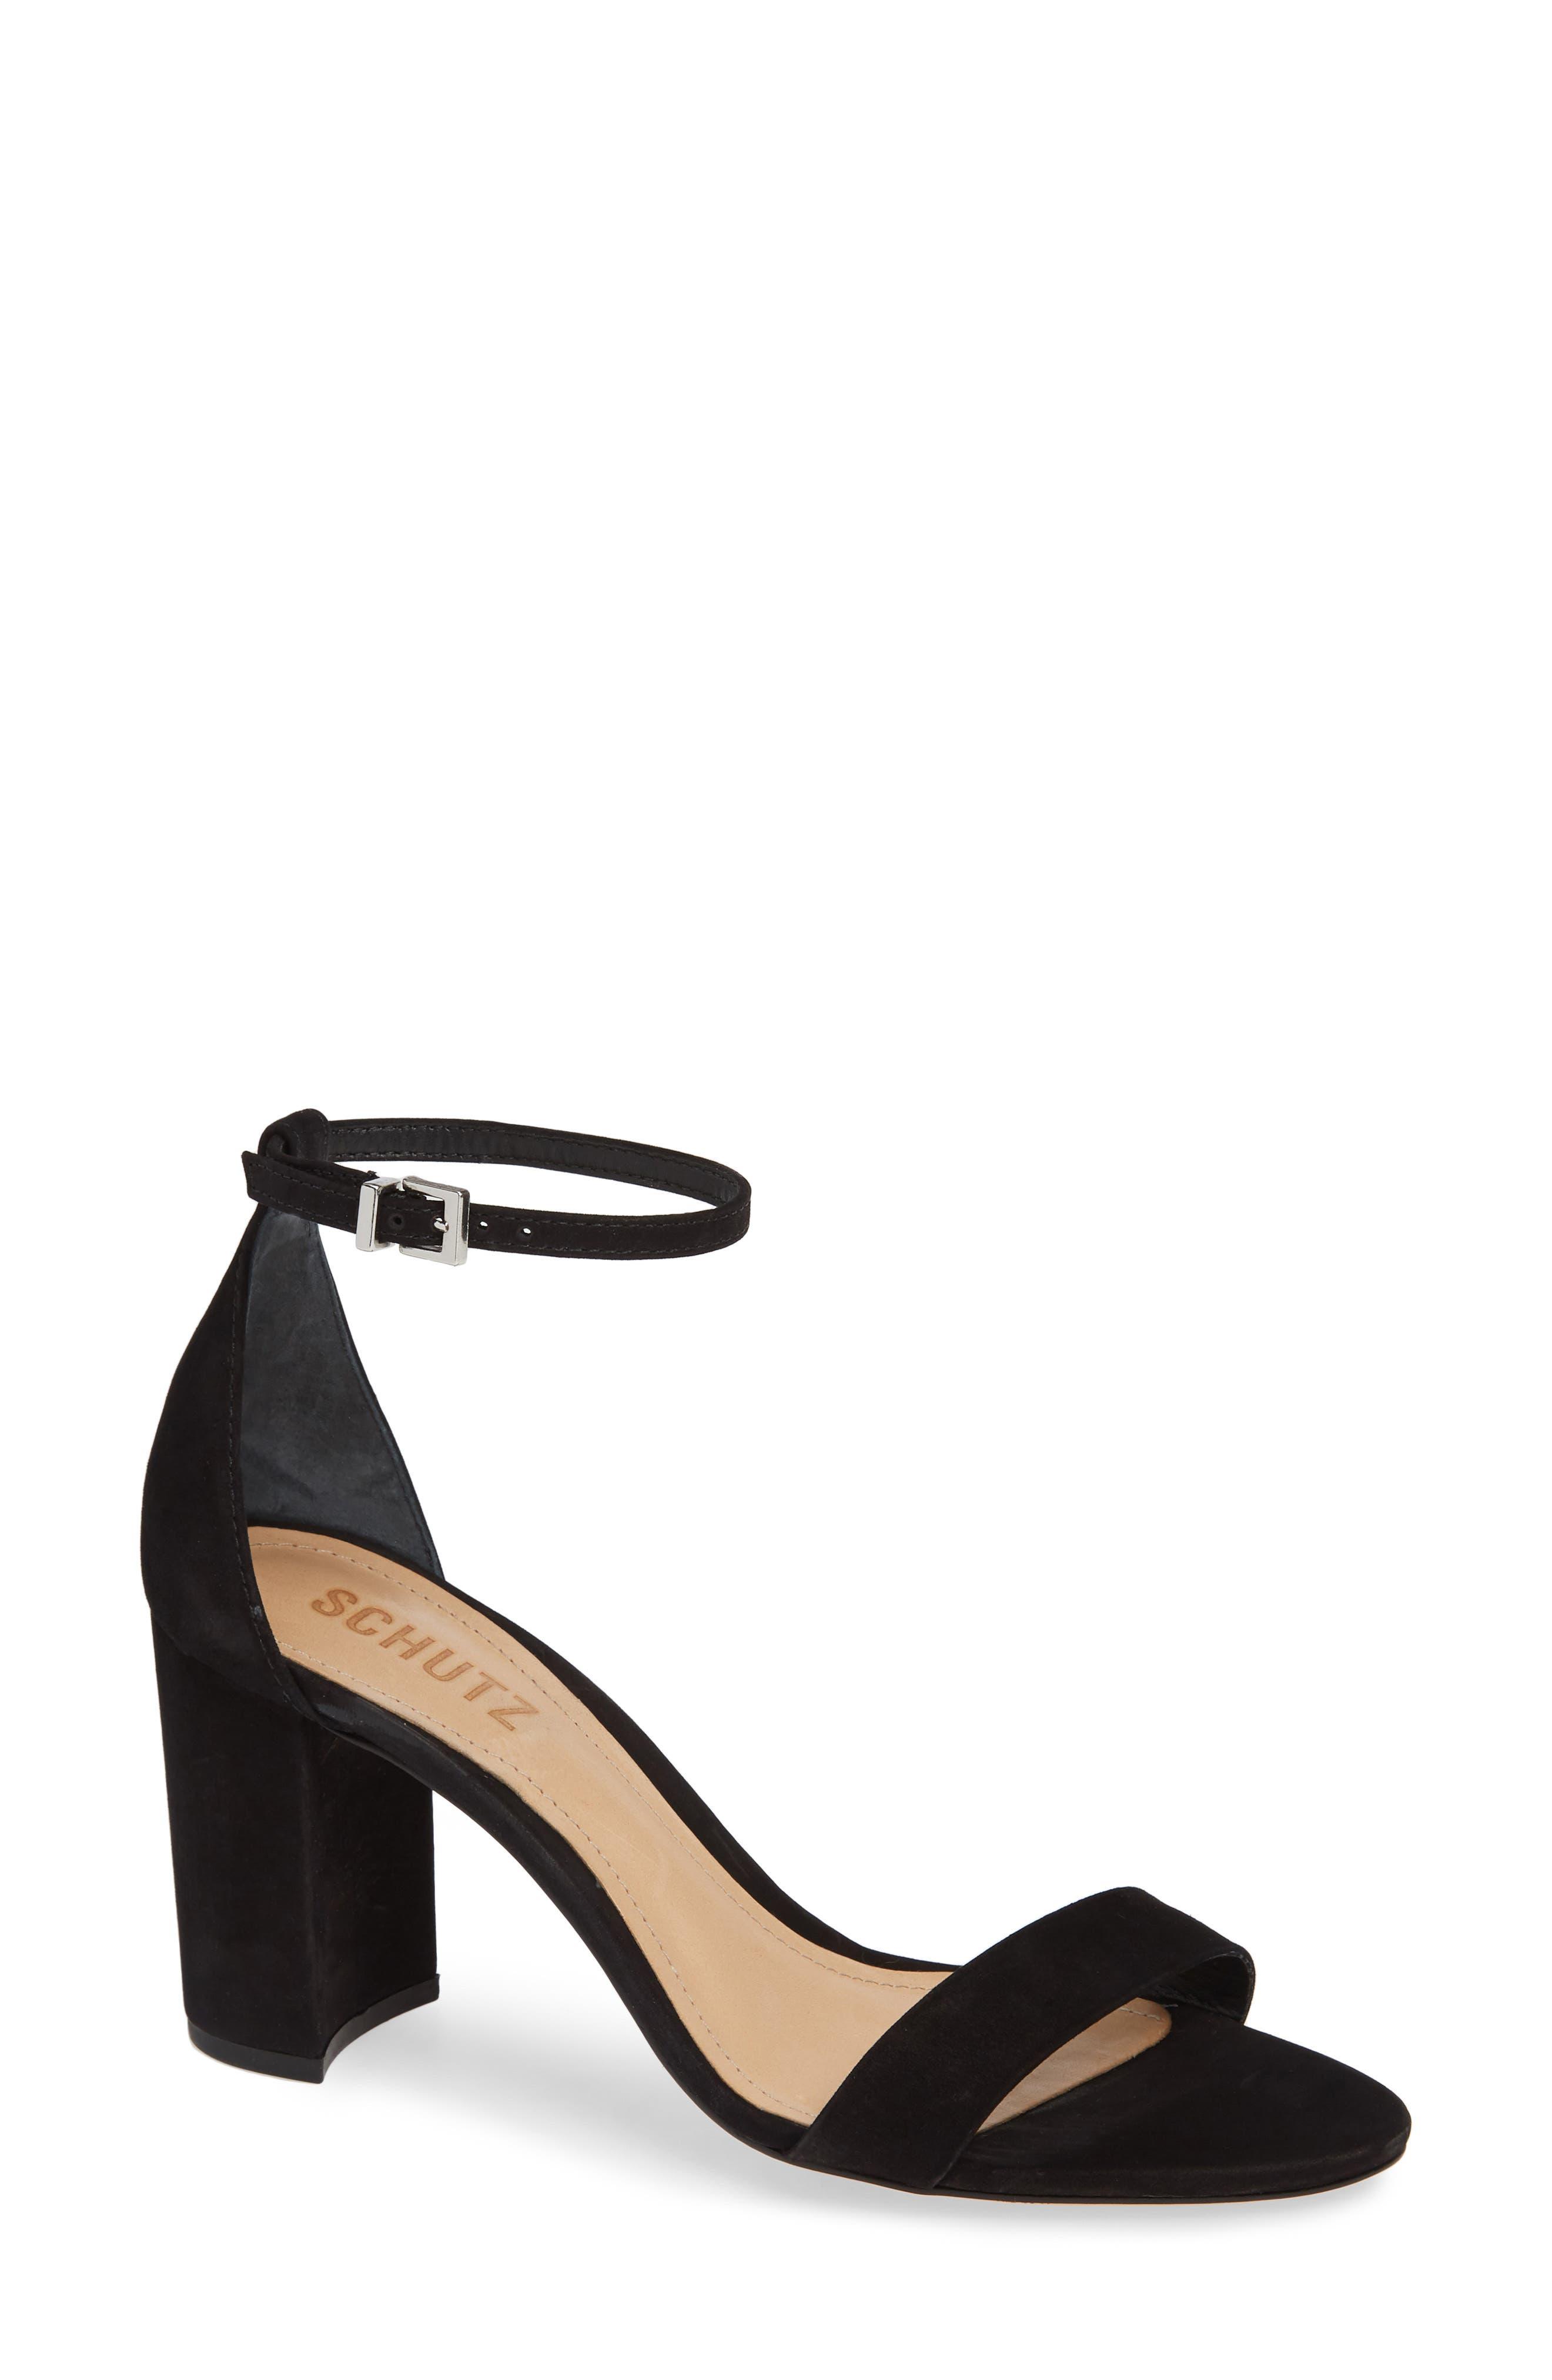 Anna Lee Ankle Strap Sandal,                         Main,                         color, BLACK NUBUCK LEATHER